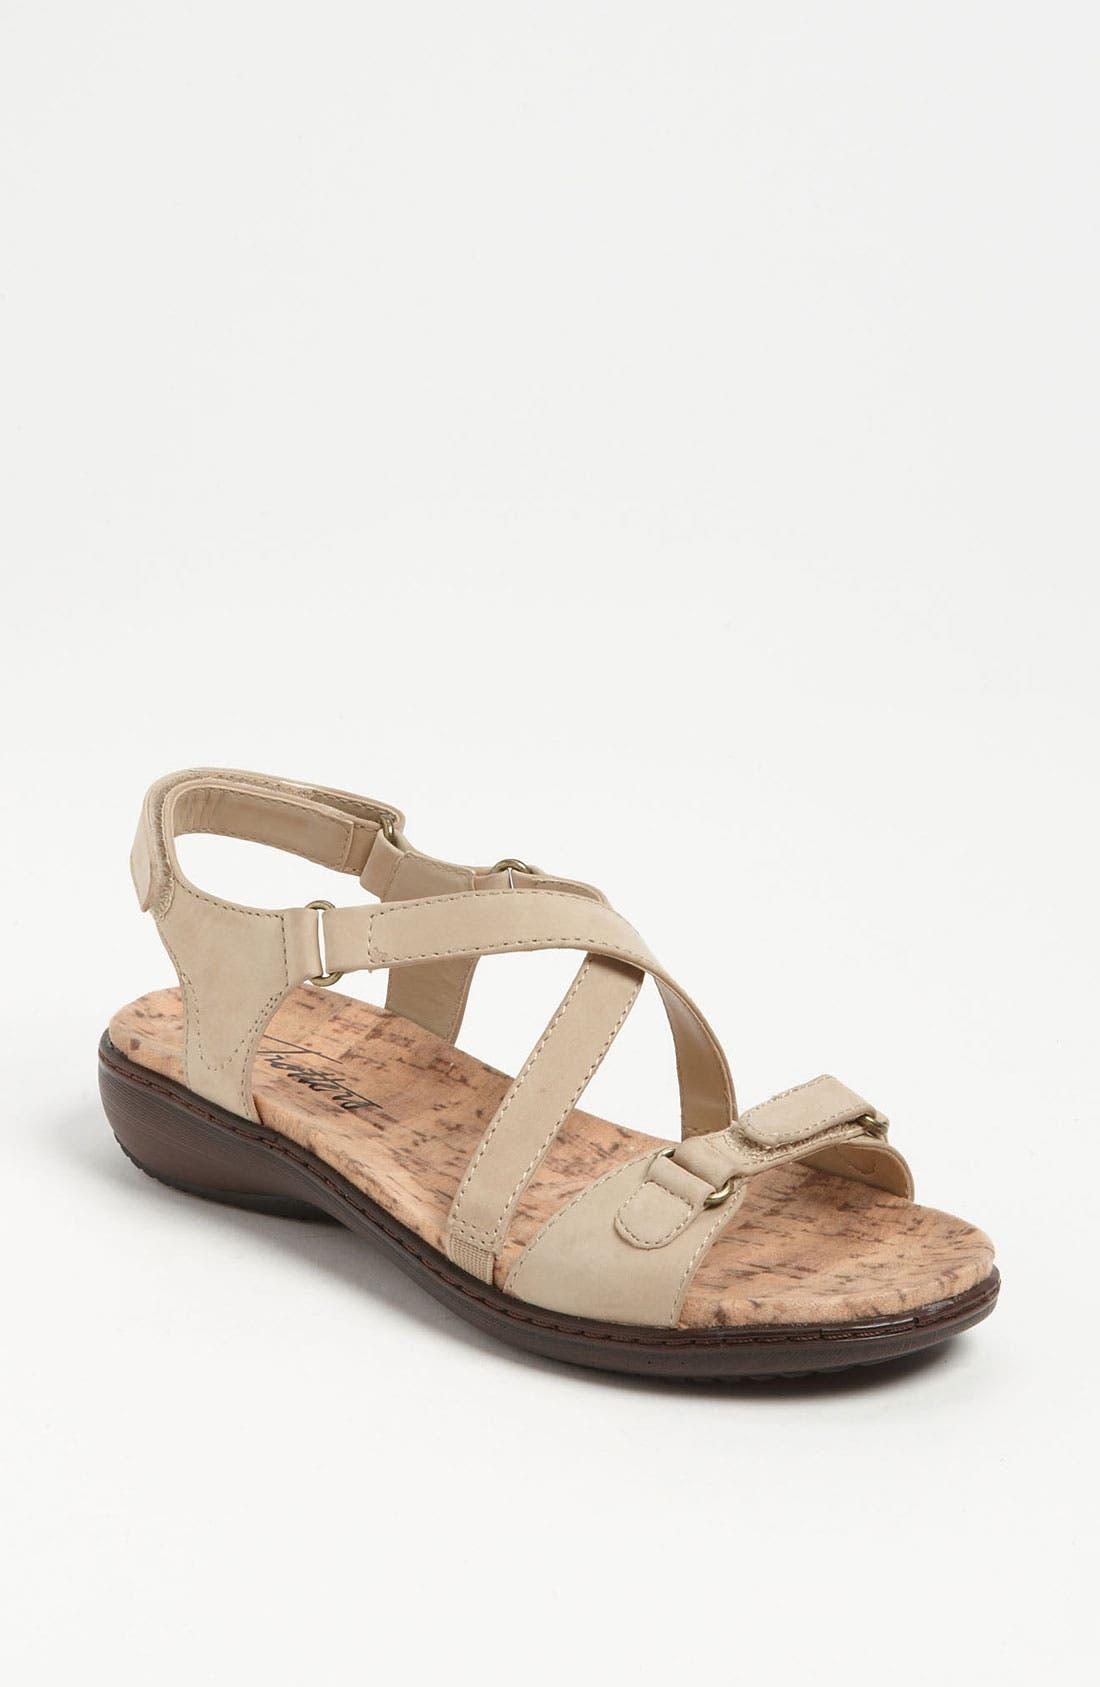 Main Image - Trotters 'Kylie' Sandal